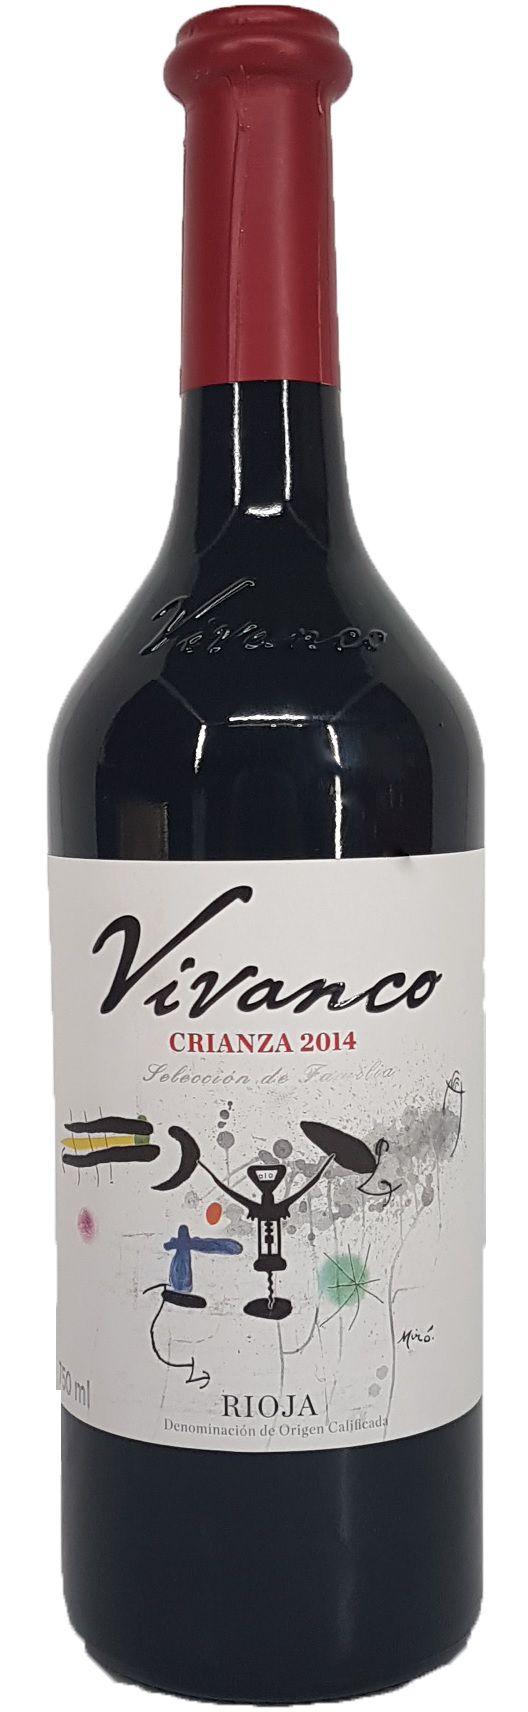 Vinho Vivanco Crianza Rioja - 750ml -